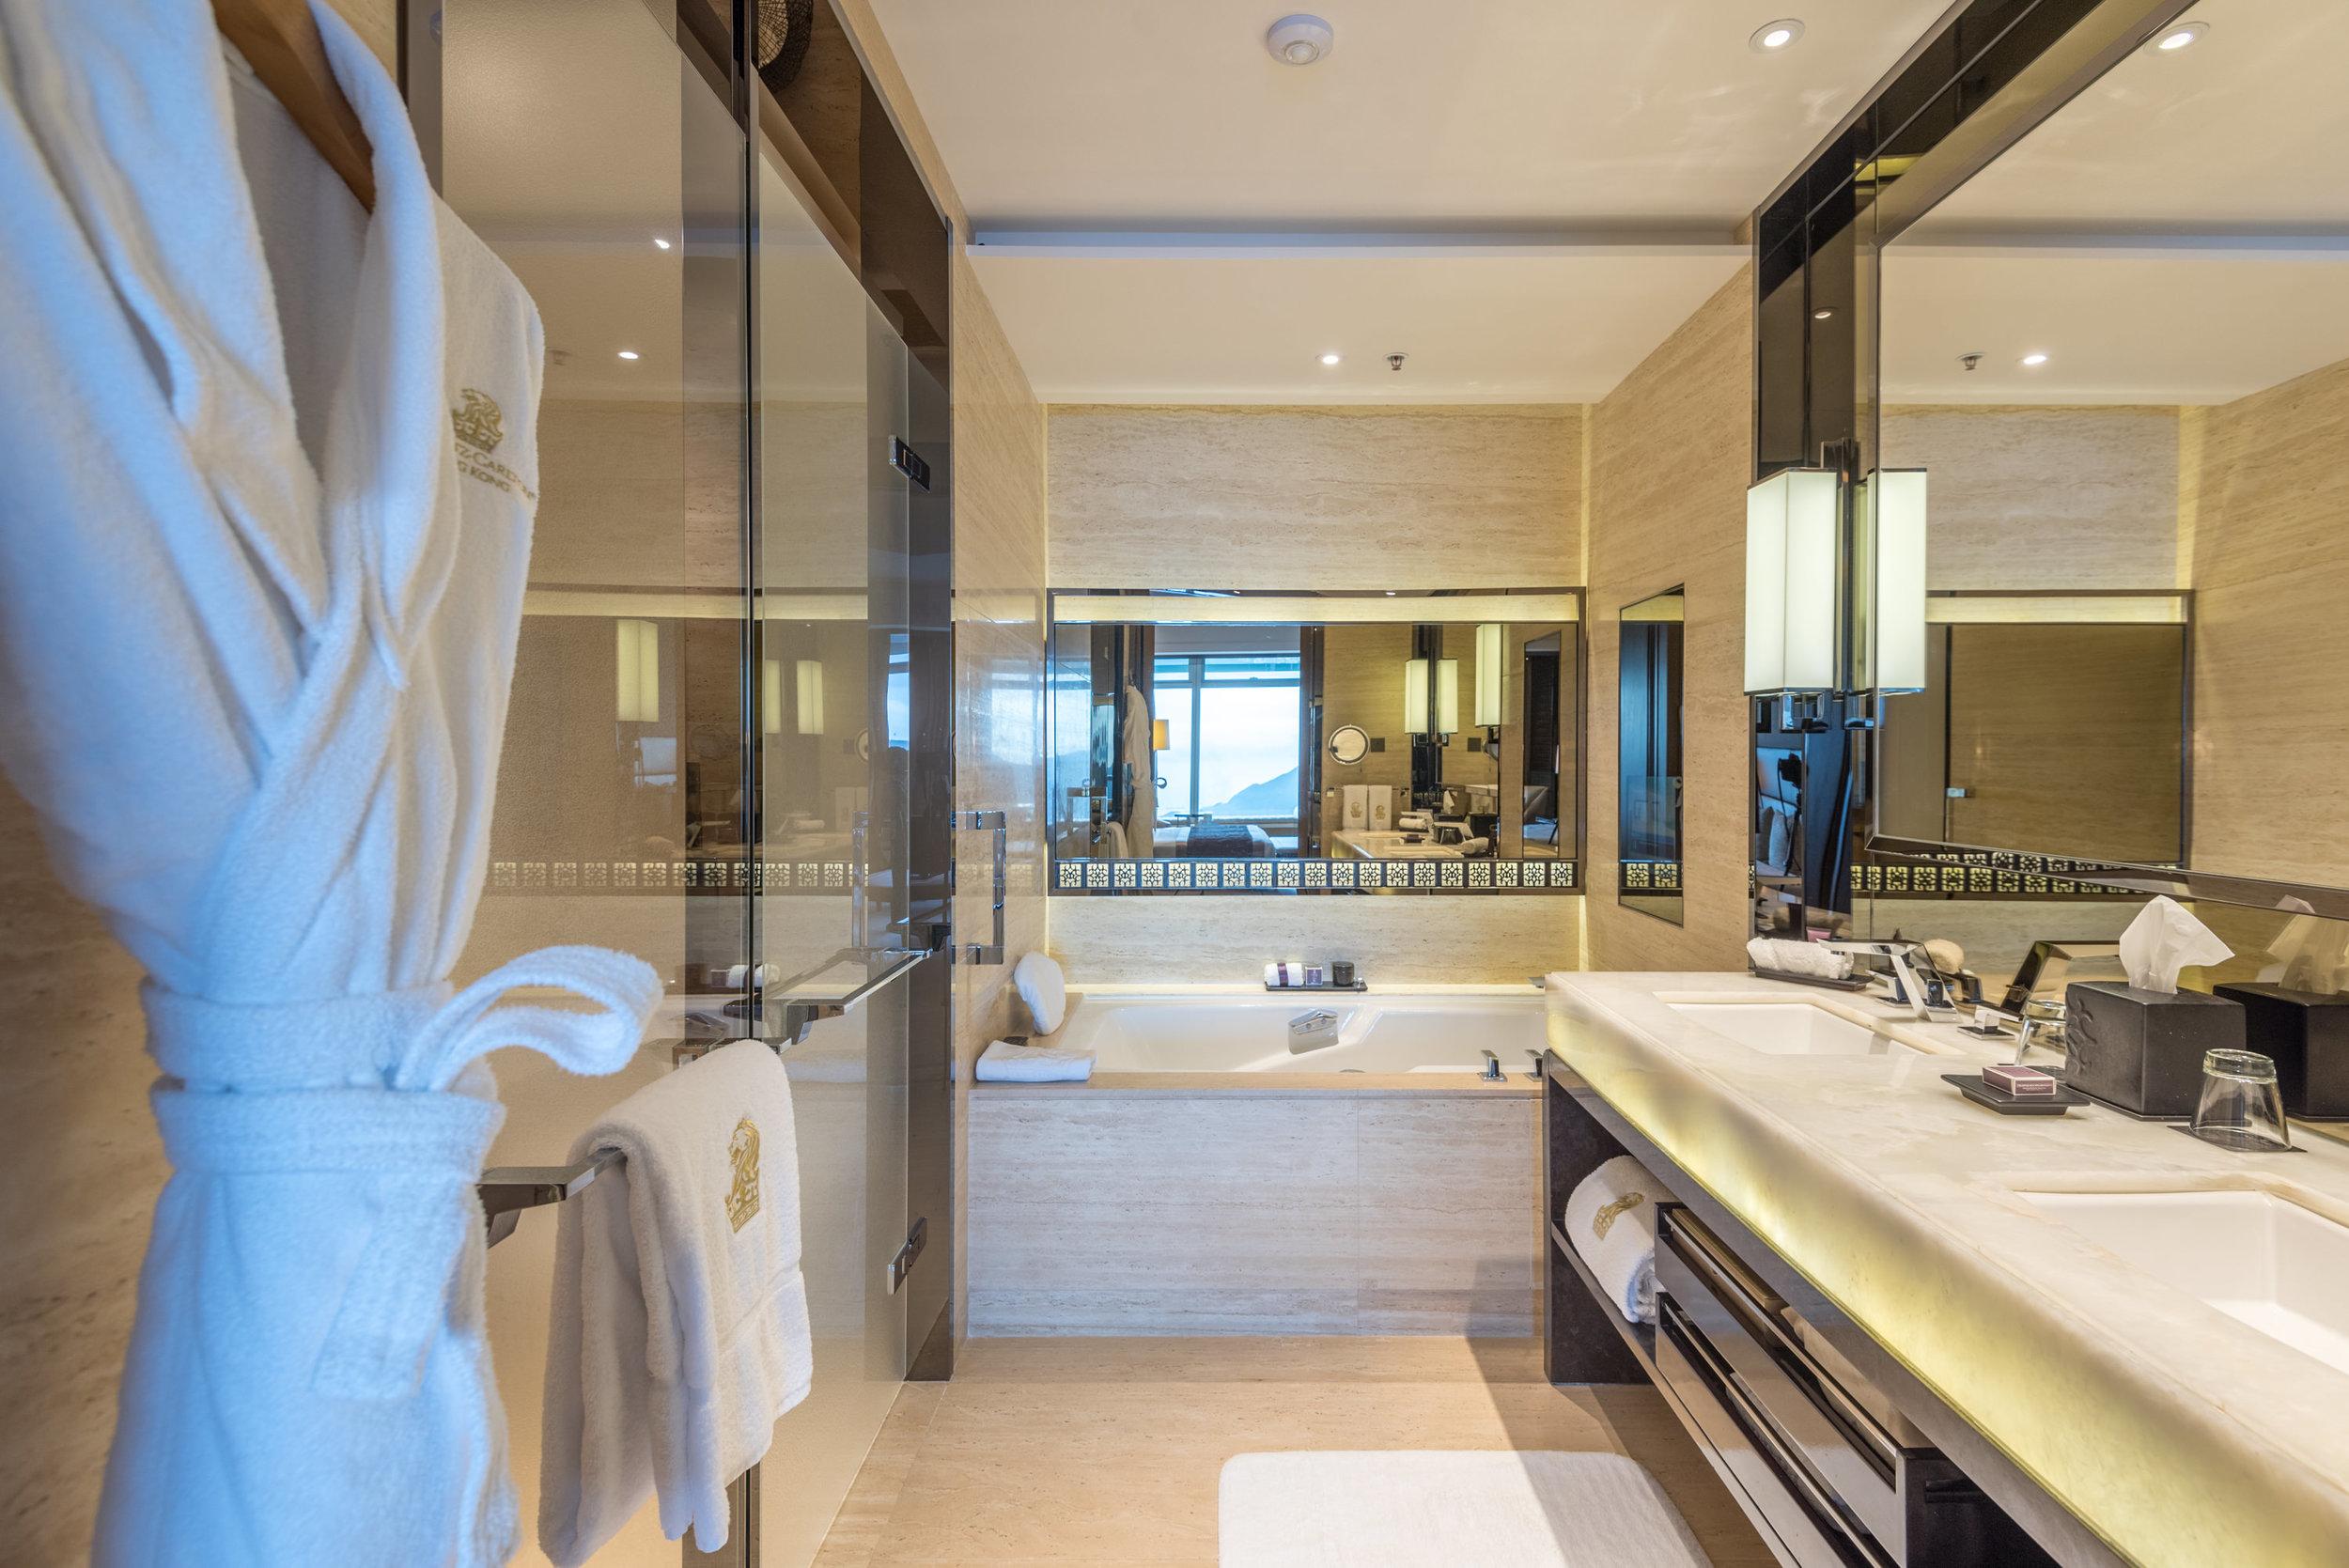 Bathroom with Bathtub  Club Deluxe Victoria Harbour Room - The Ritz-Carlton, Hong Kong